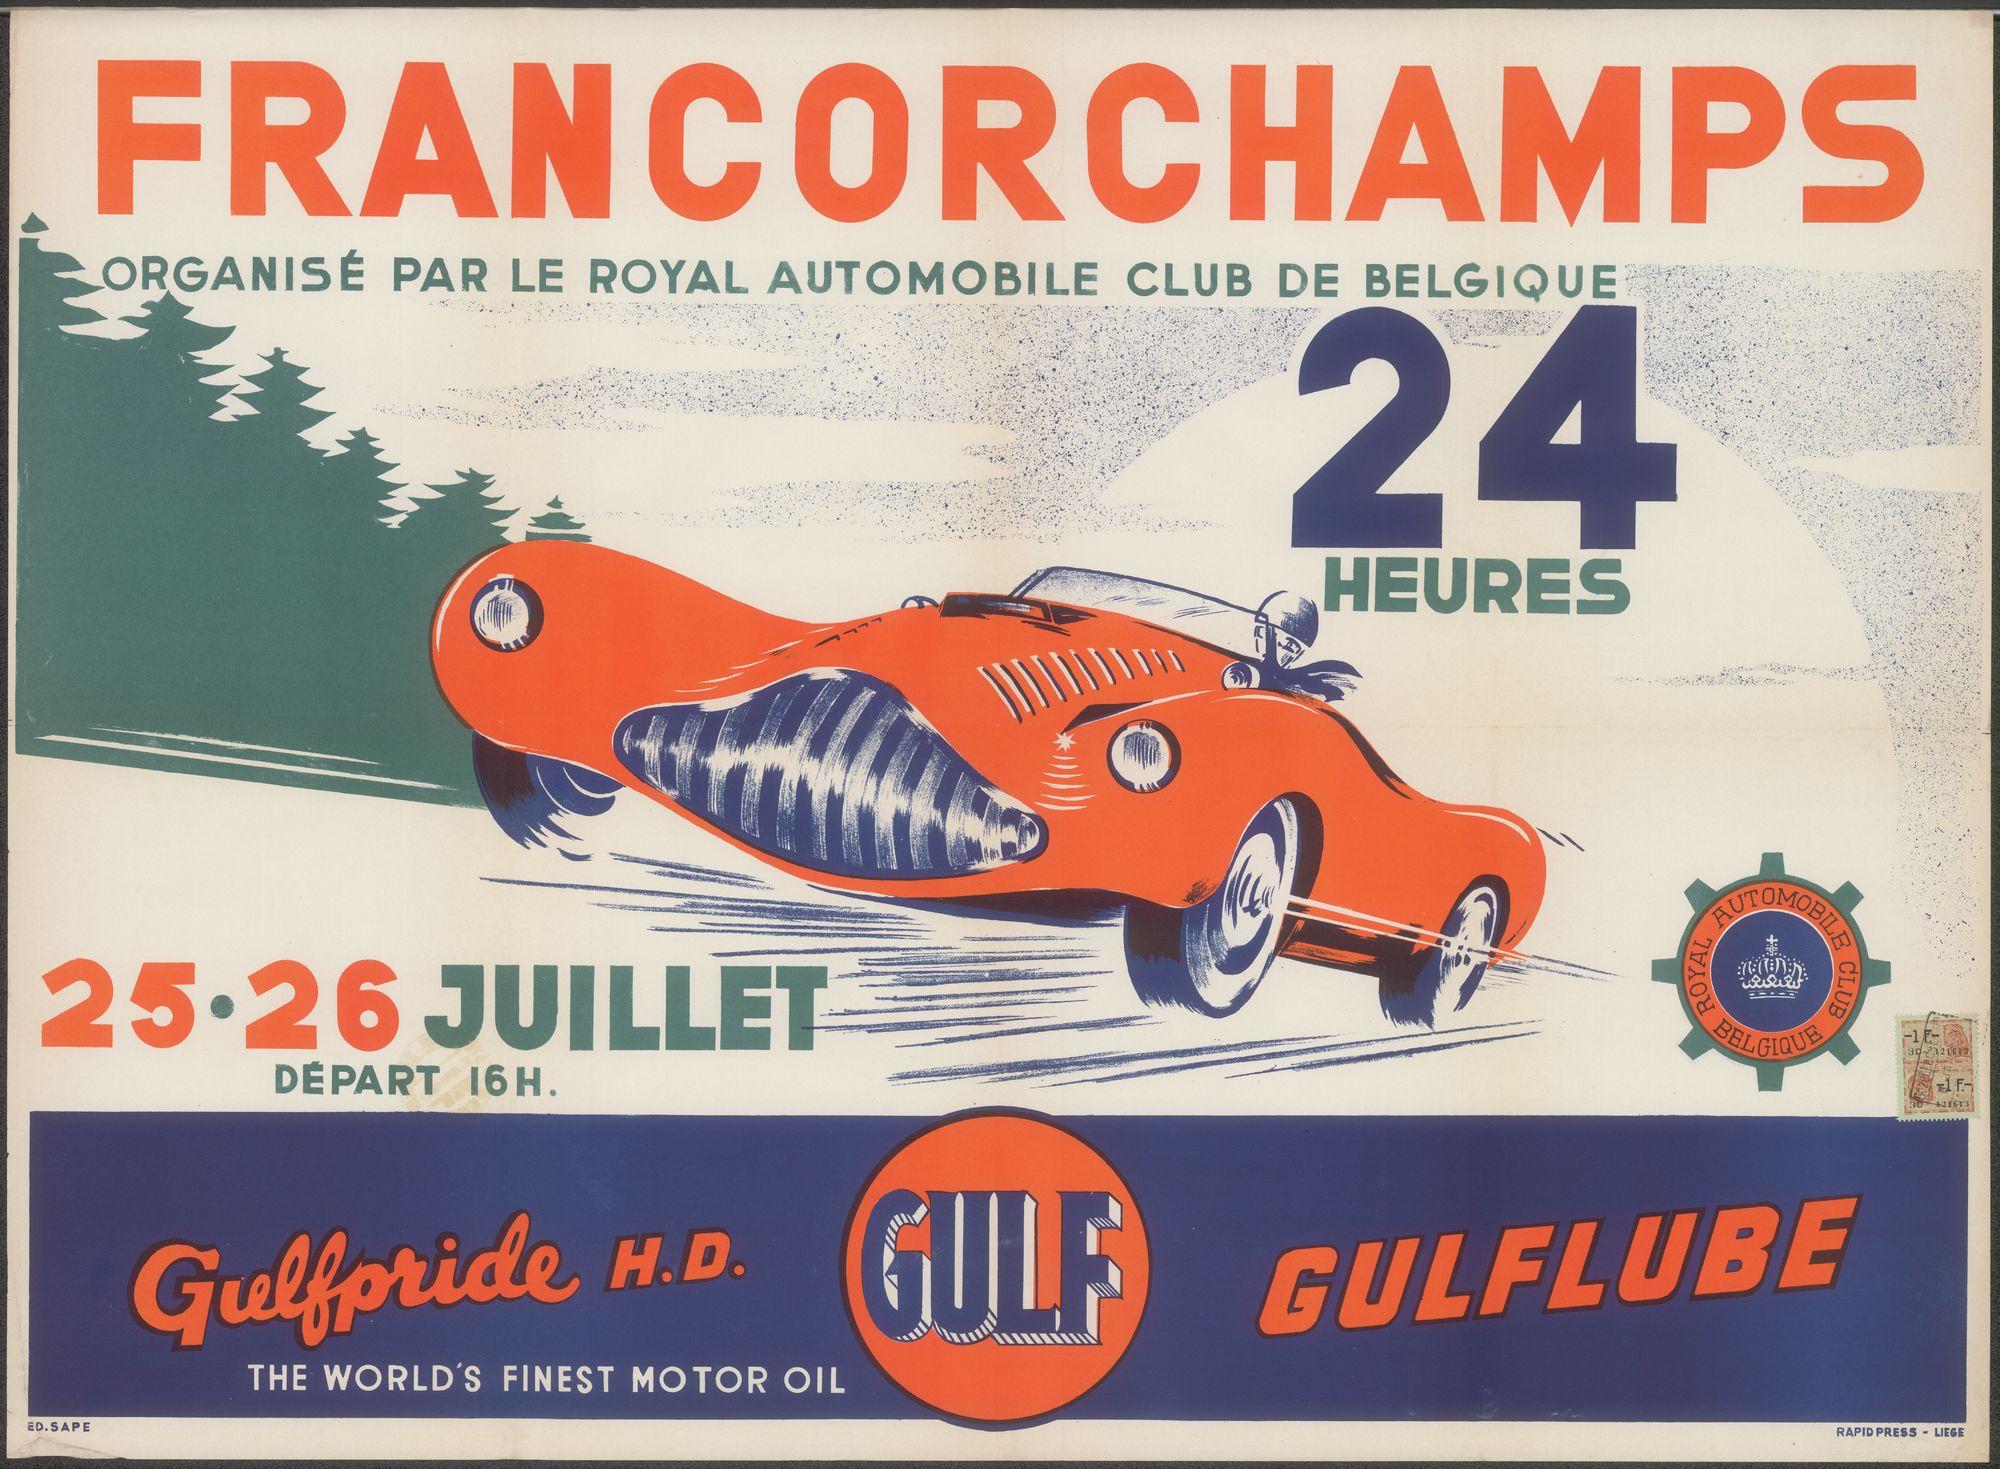 24 Heures de Francorchamps, SPA - Francorchamps, 25 - 26 juillet - juli 1953